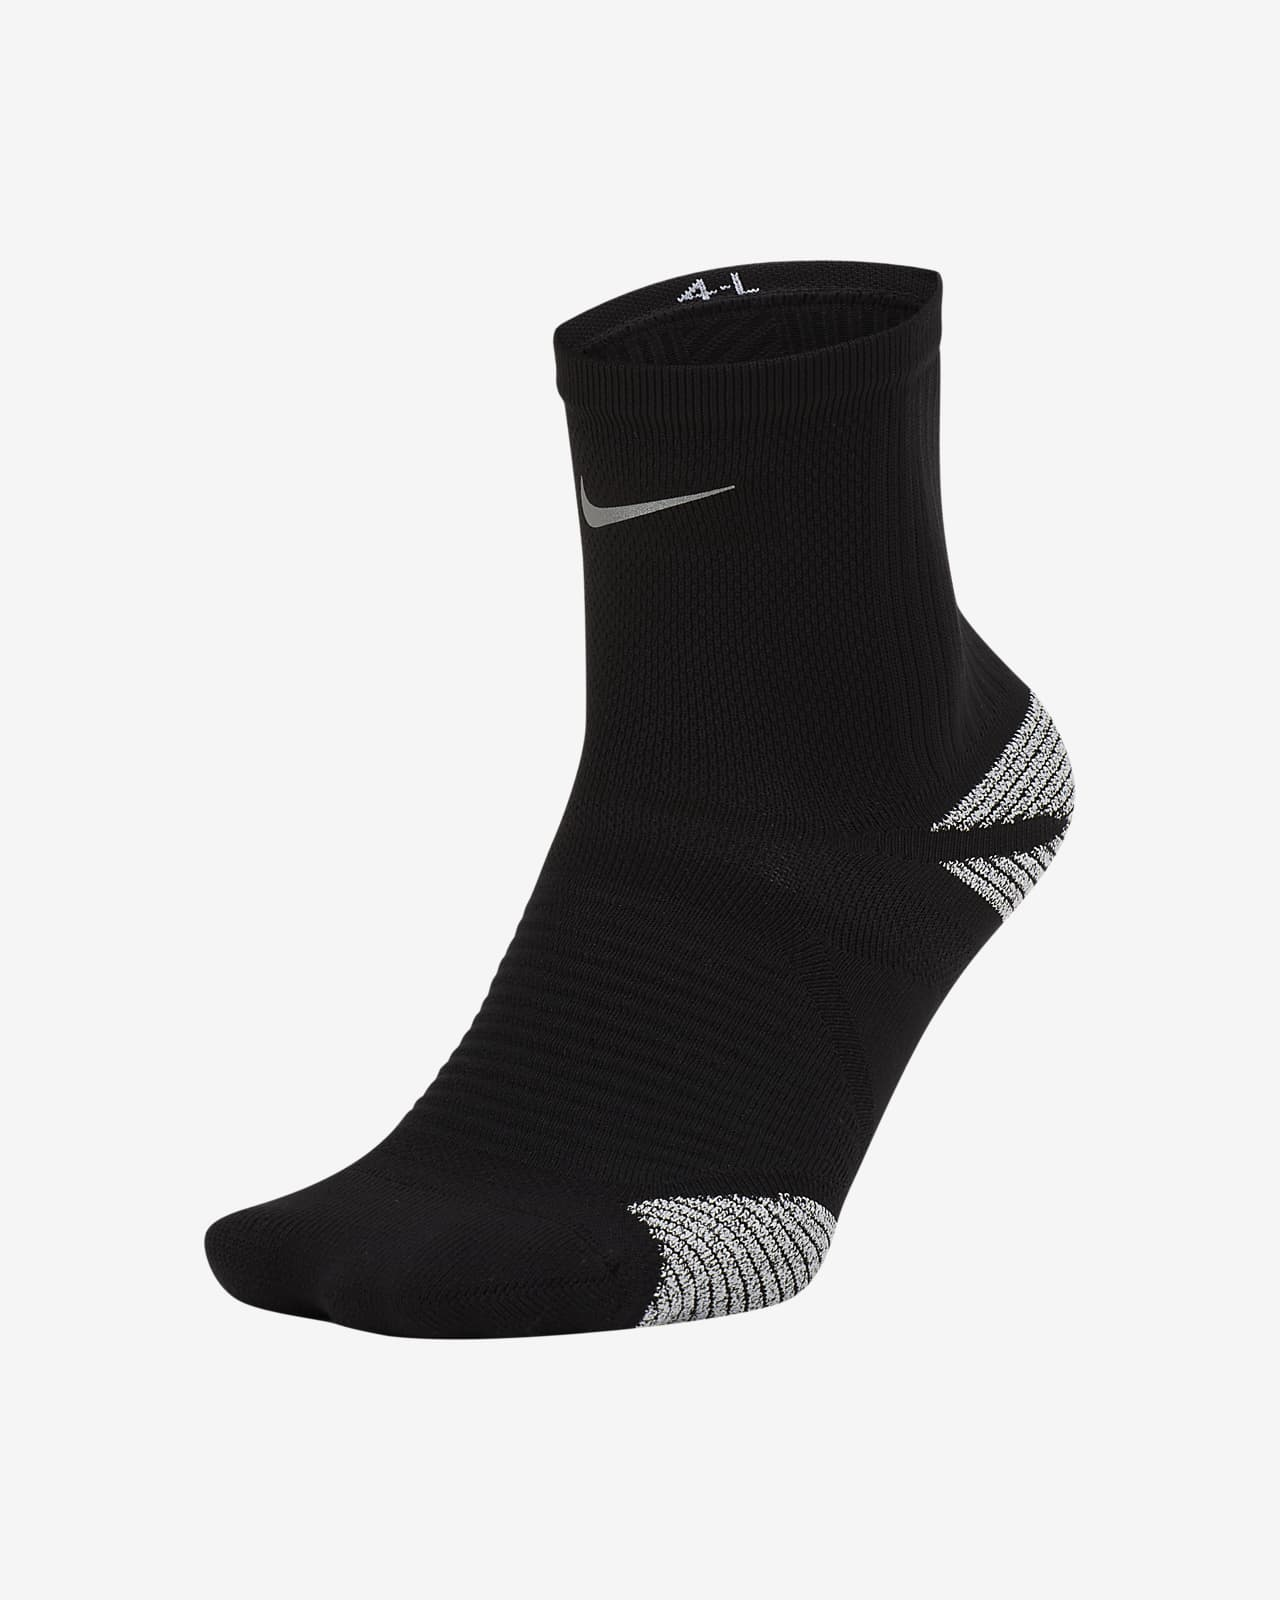 Calcetines cortos Nike Racing